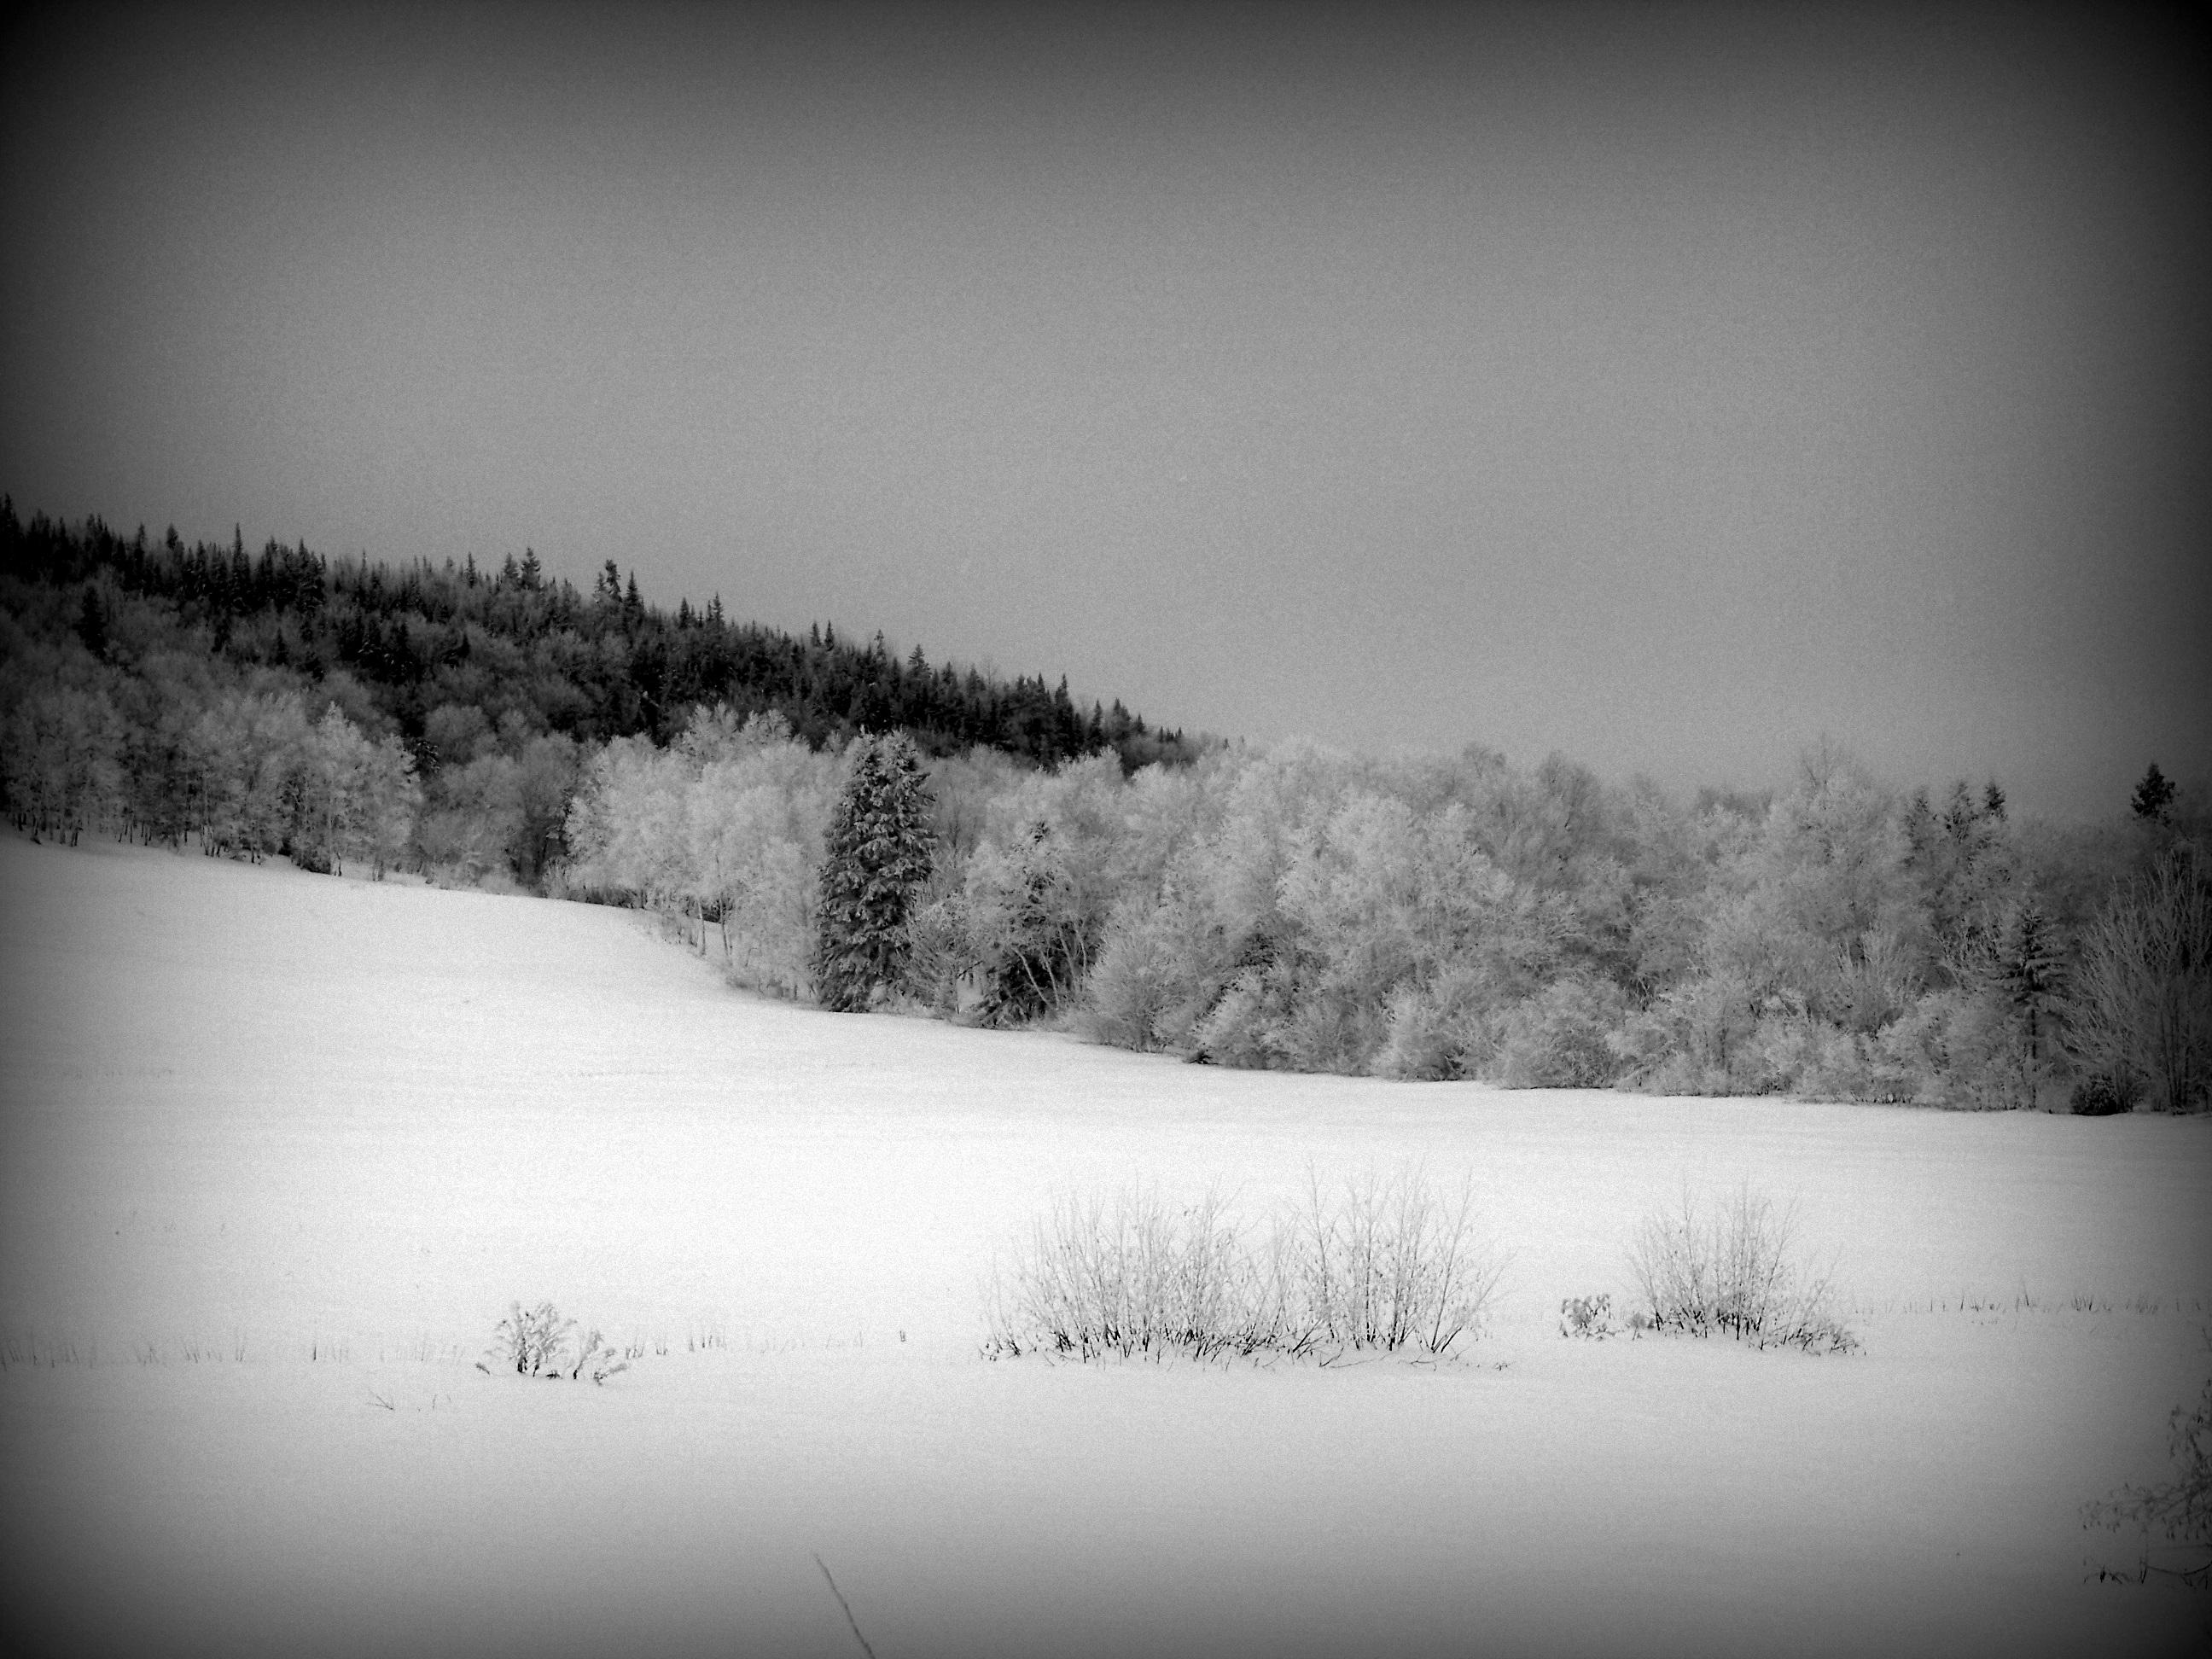 Winter Dream by philippeL